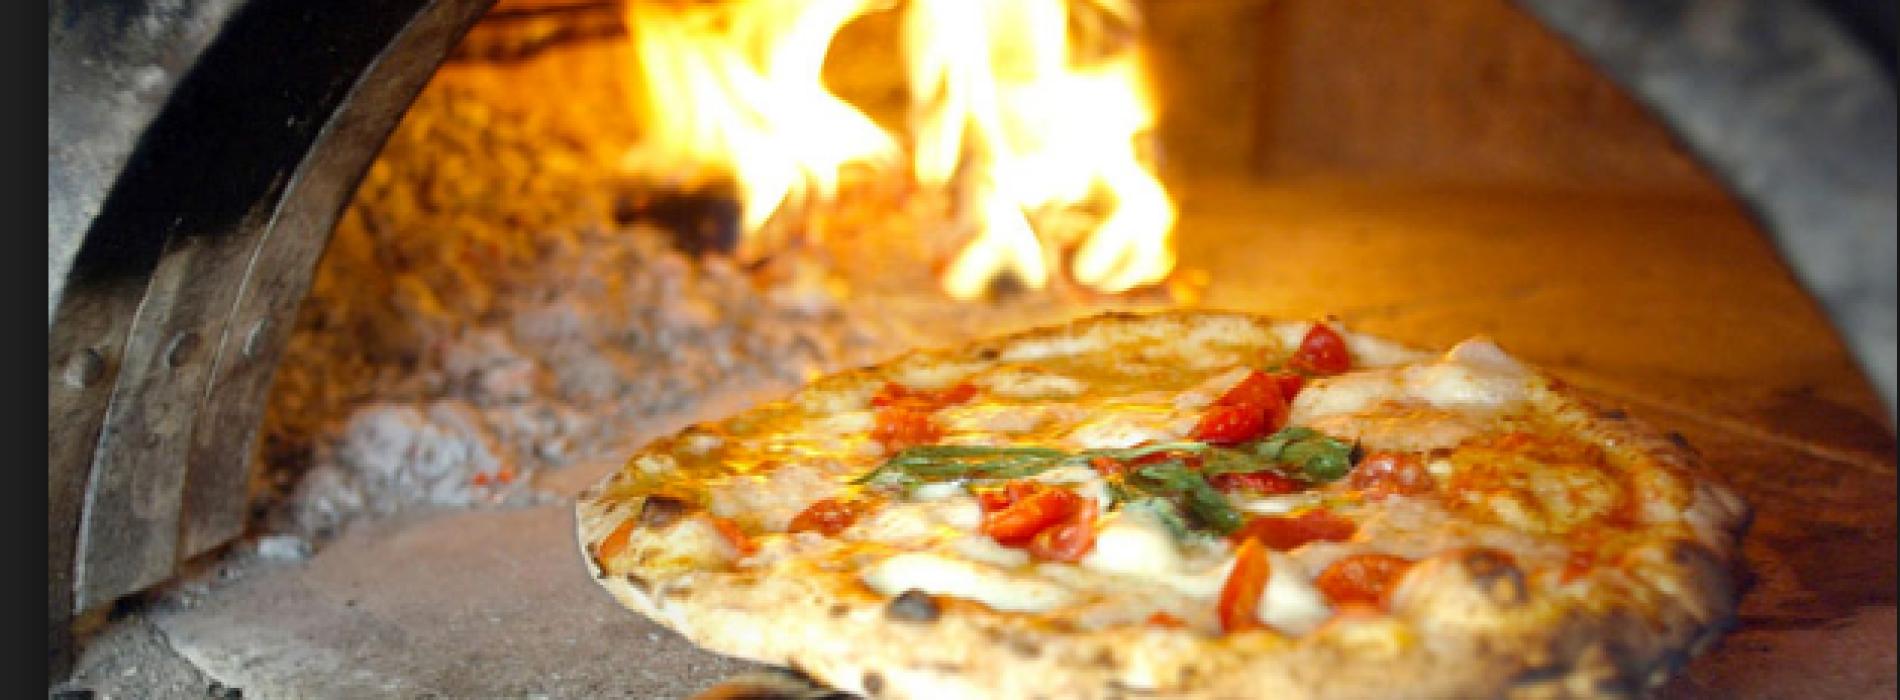 Caserta ospita il Pizza & Food Made in Sud